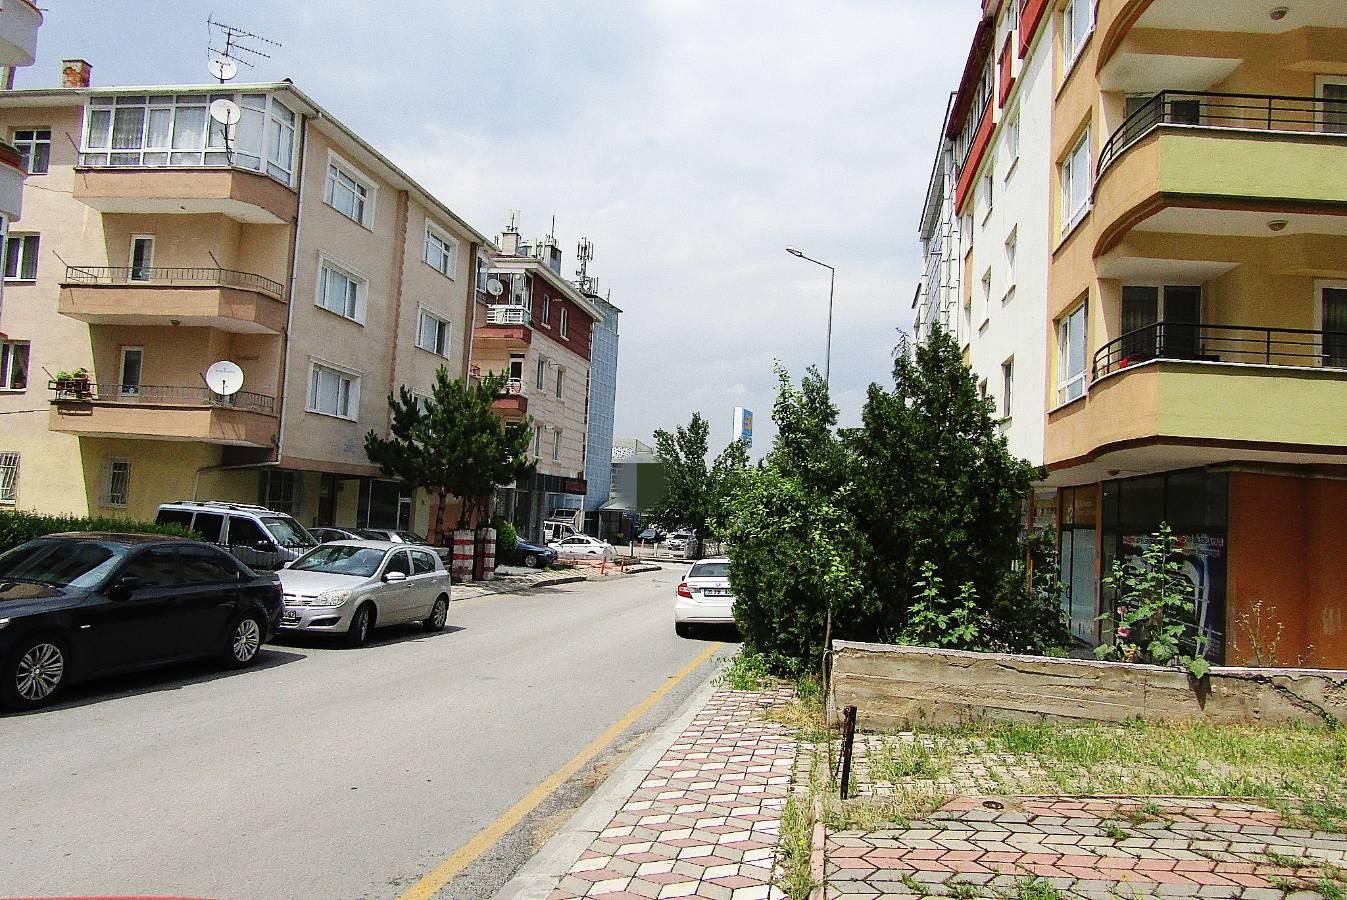 SR EMLAK'TAN PİYADE MAH'DE 35m² CADDEYE YAKIN KİRALIK DÜKKAN